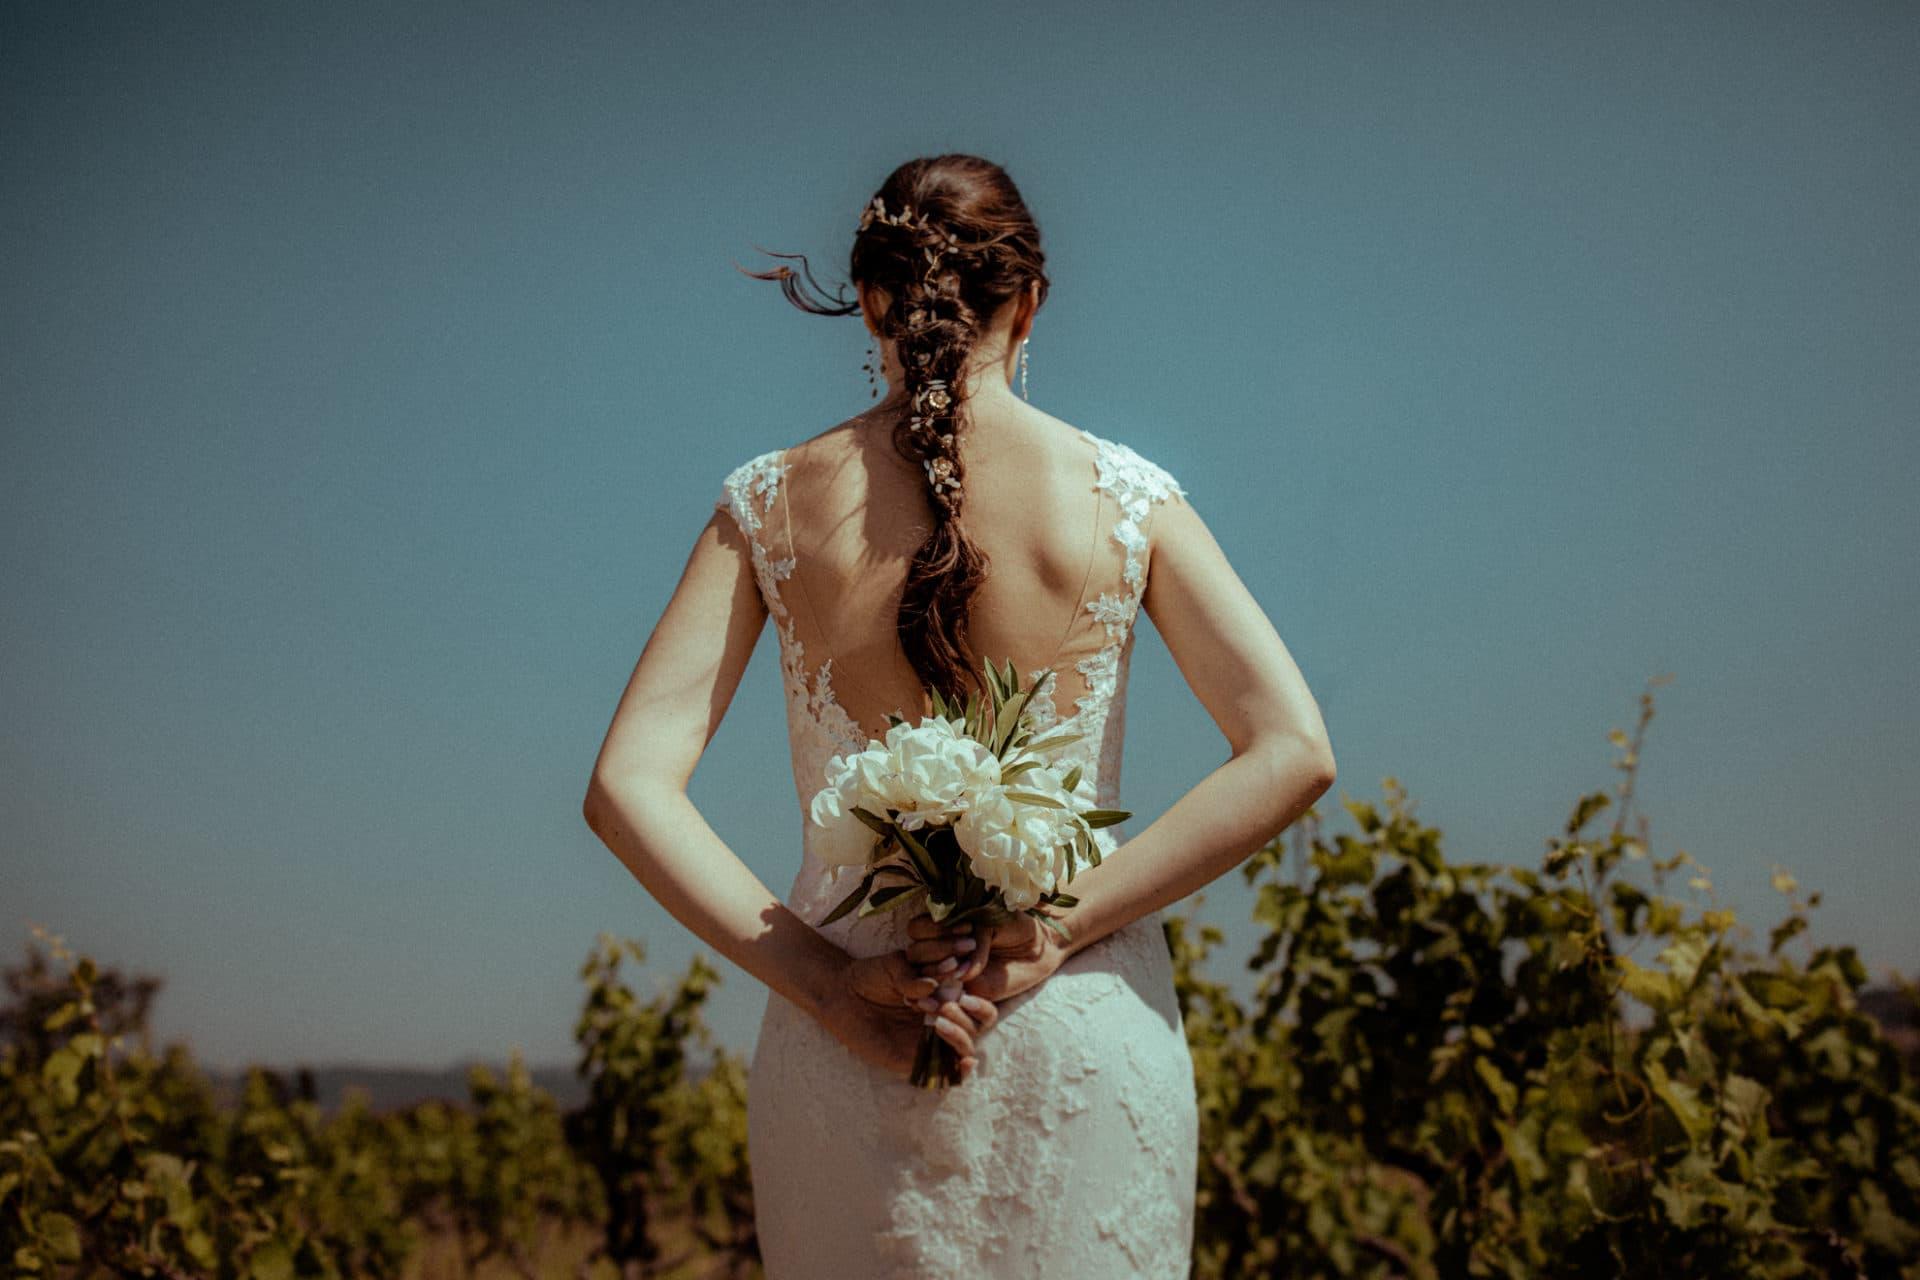 the beautiful bride dress details